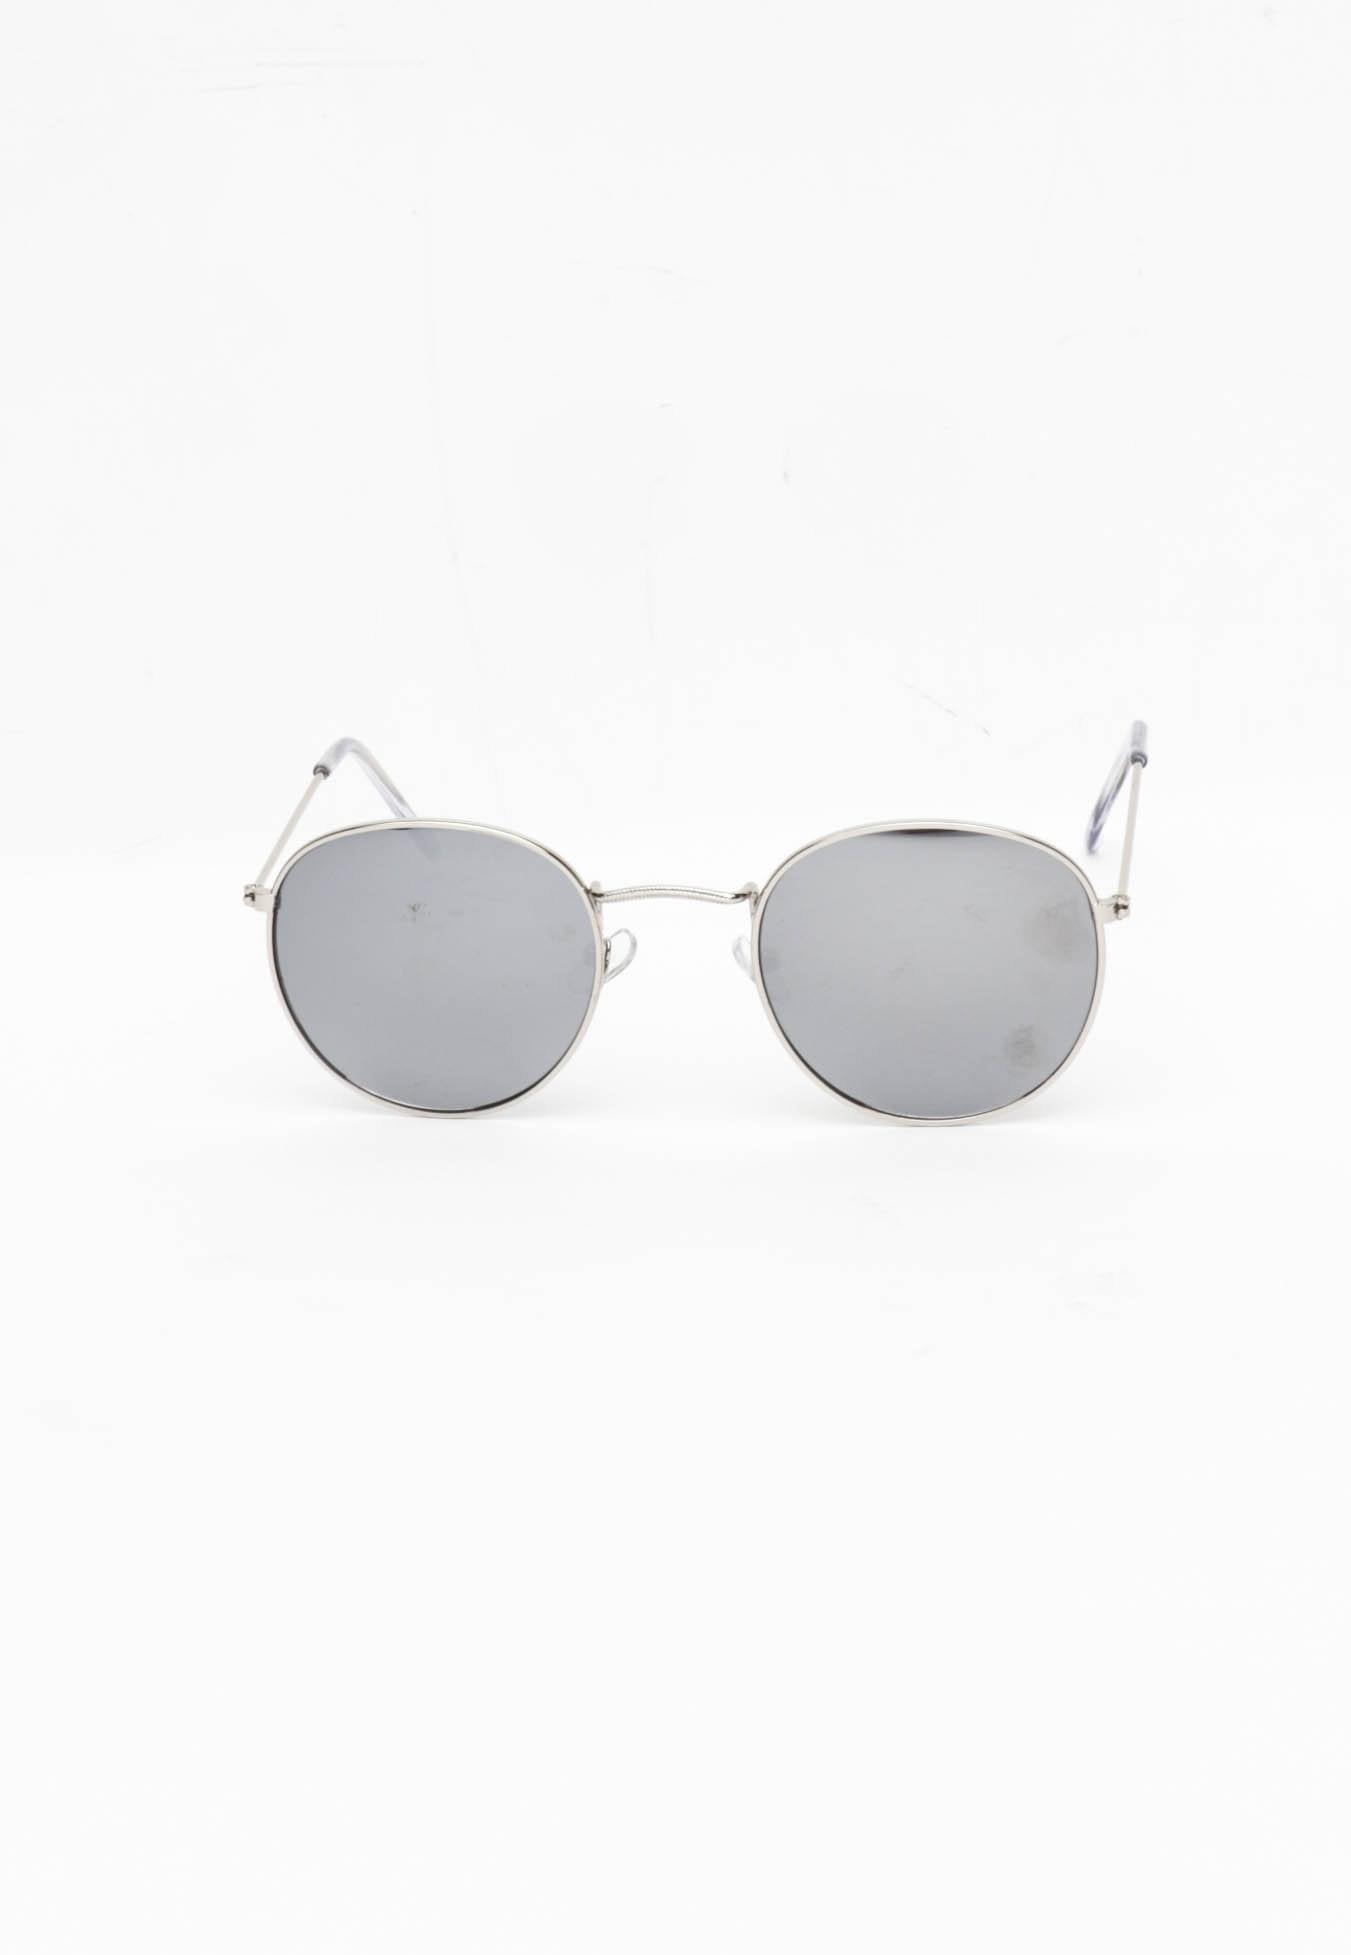 Retro Round - Silver Frame/ Silver